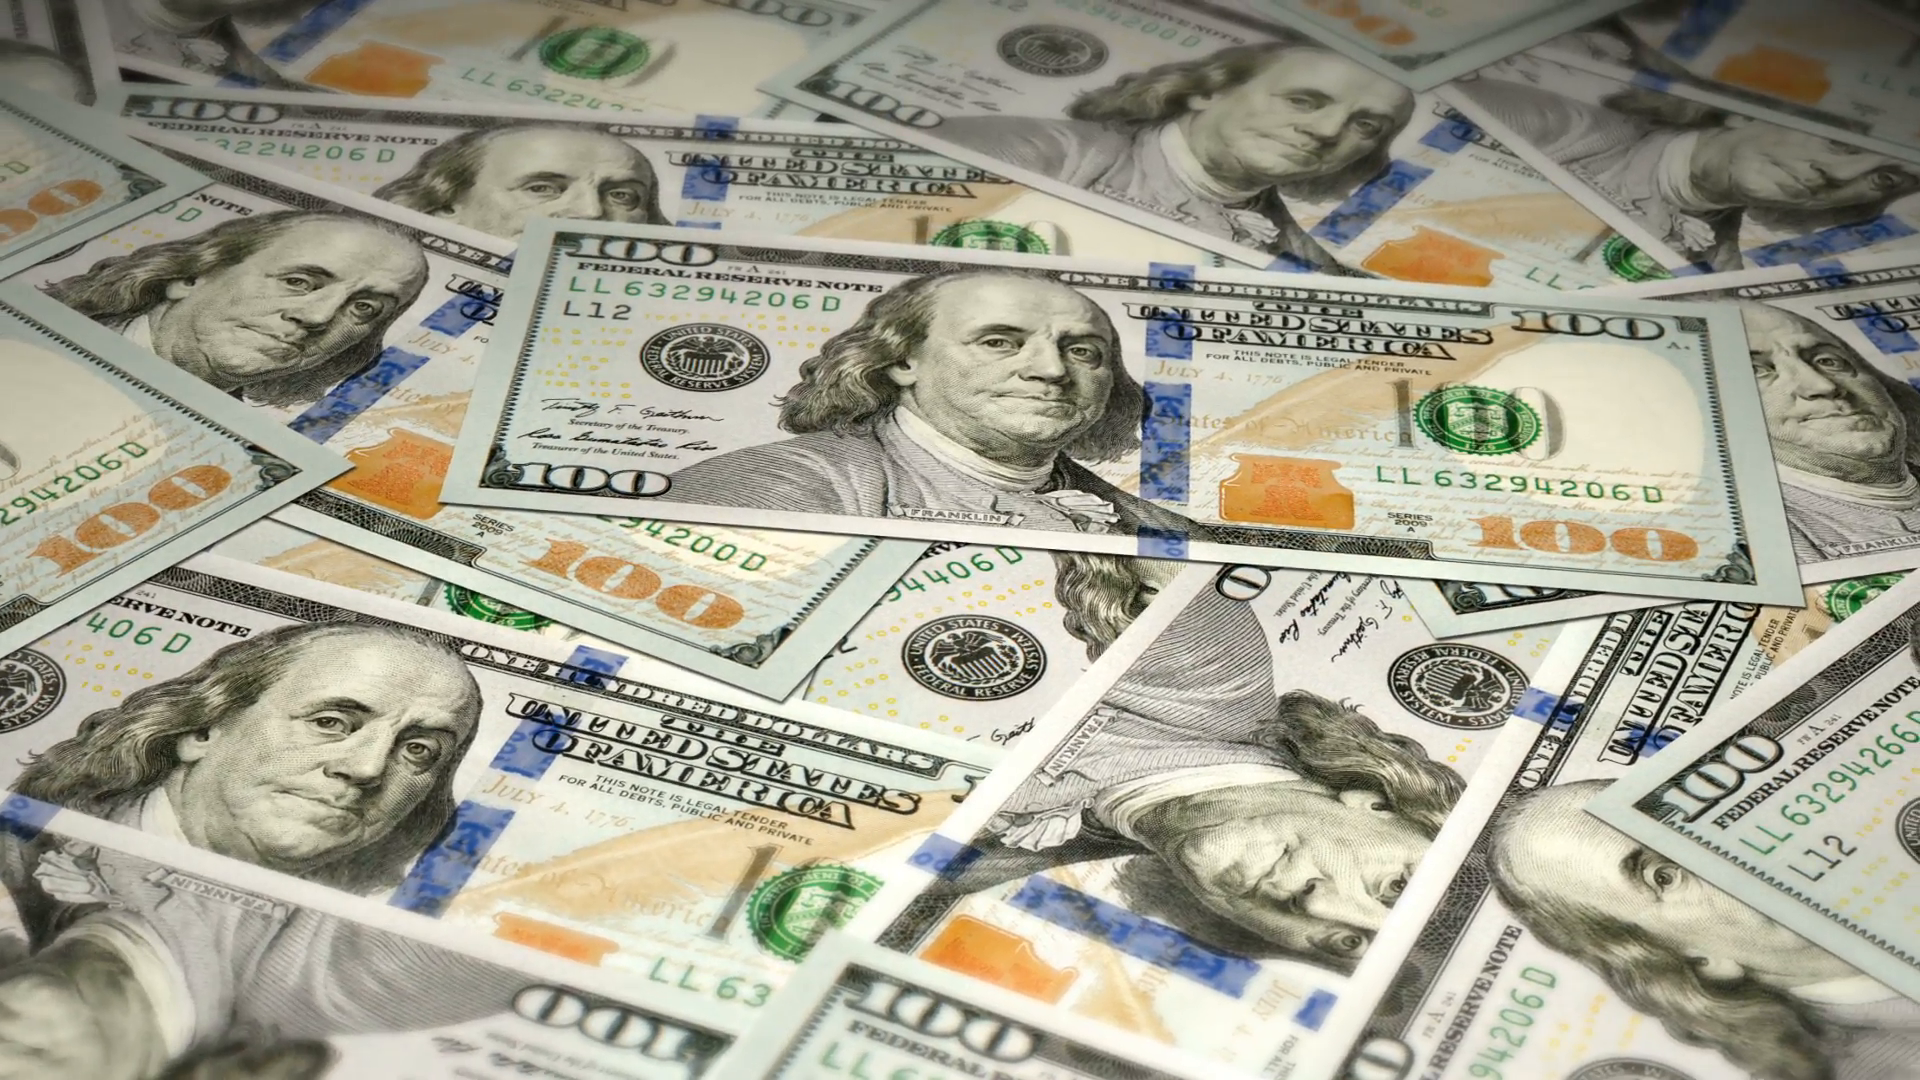 Free photo: 100 dollar bills - 100, Banking, Usd - Free ...